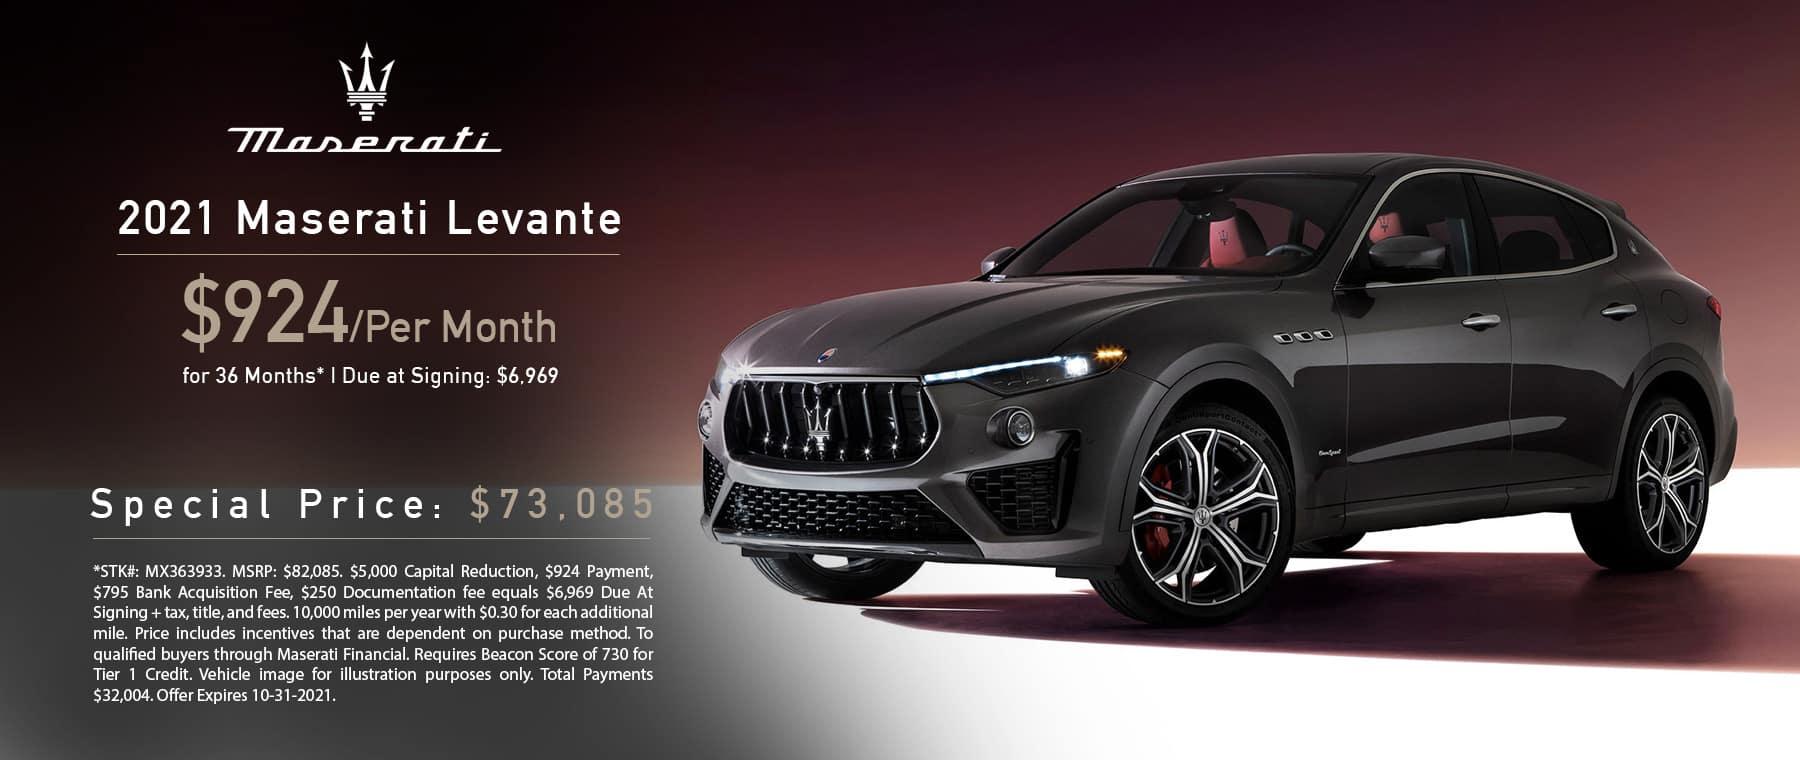 Maserati_2021_Levante_Slide_Oct2021_1